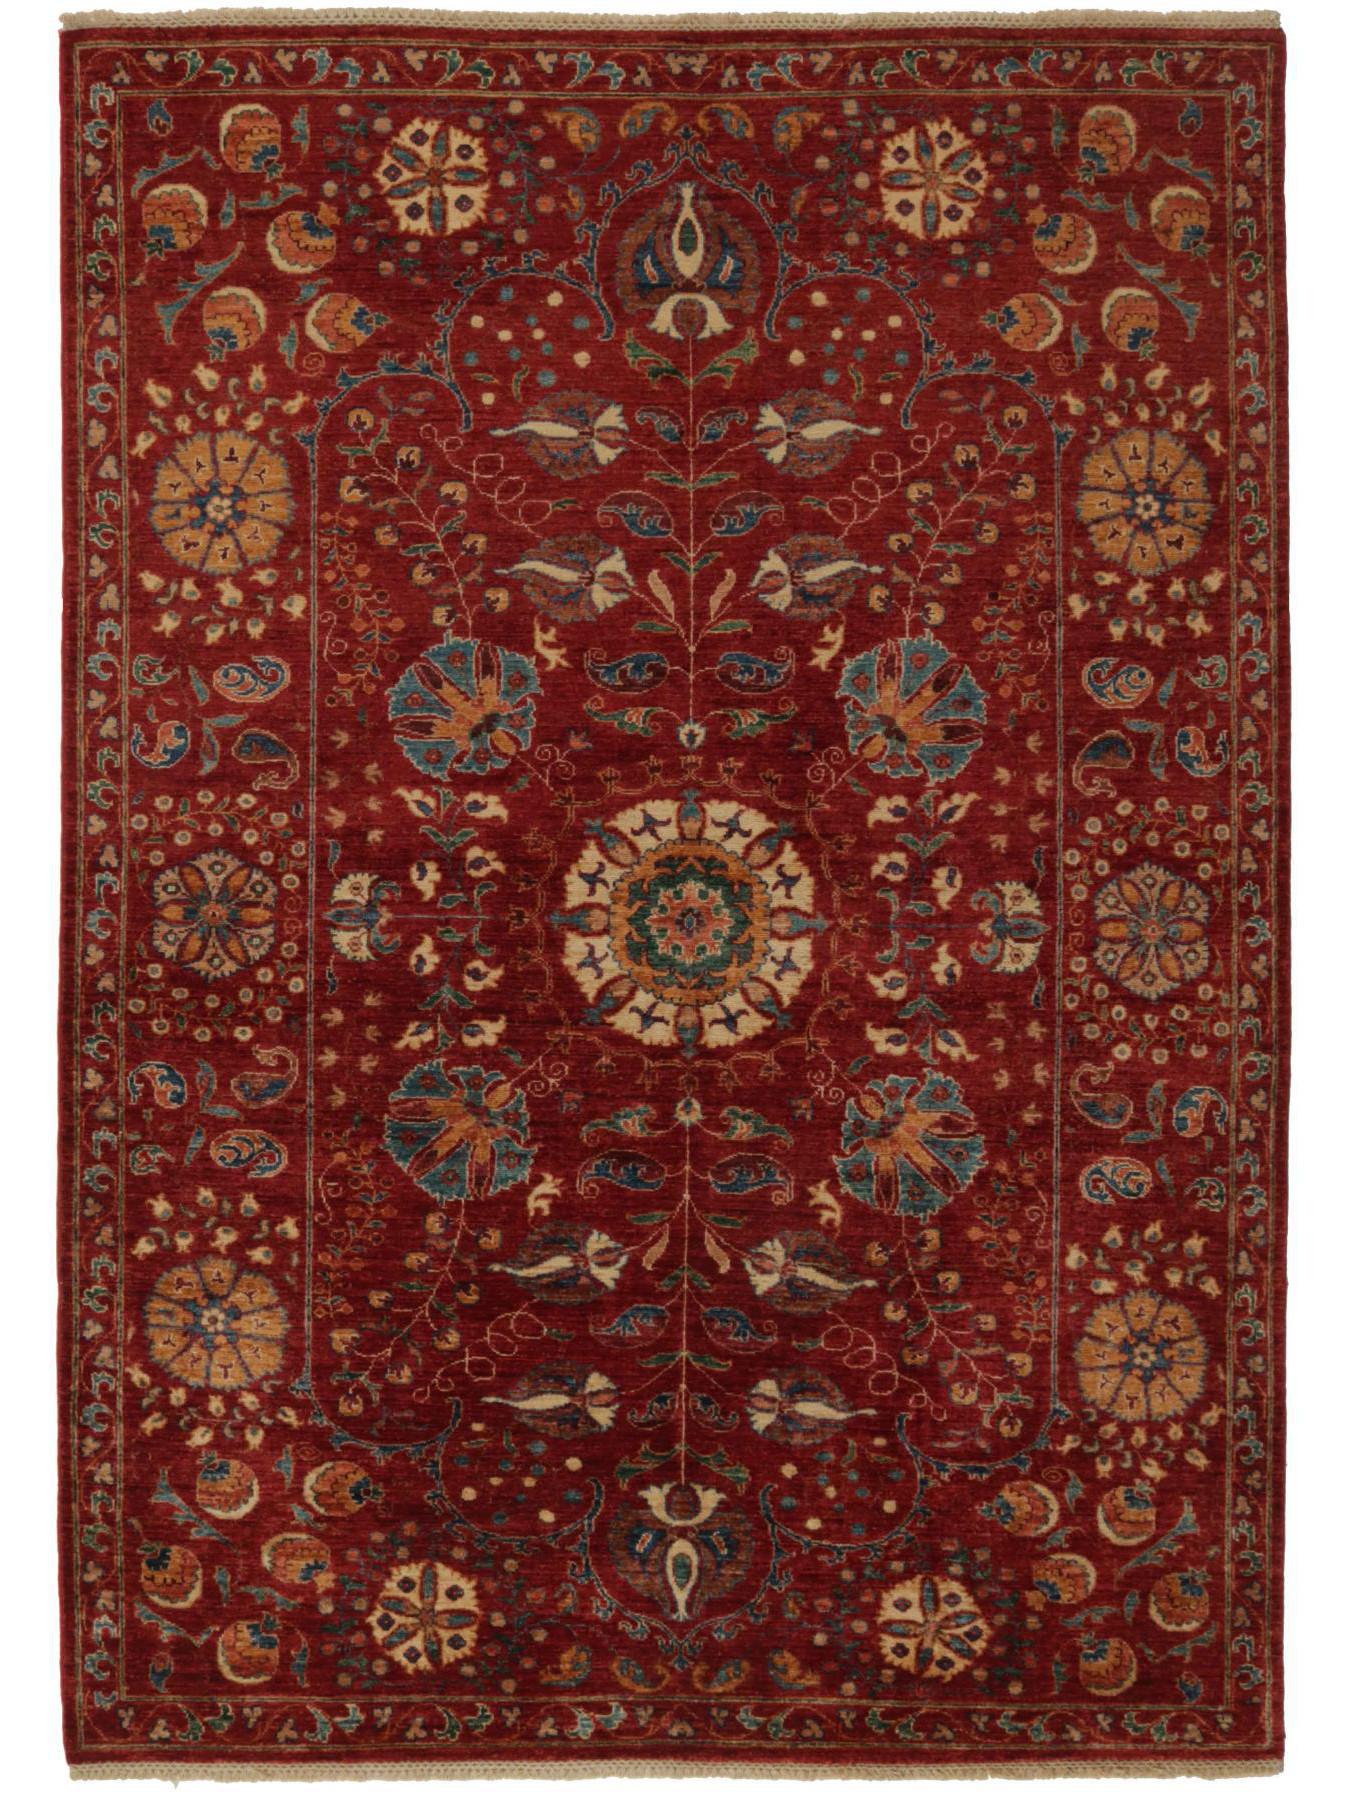 Ziegler carpets - Ziegler Fine- Ariana Style